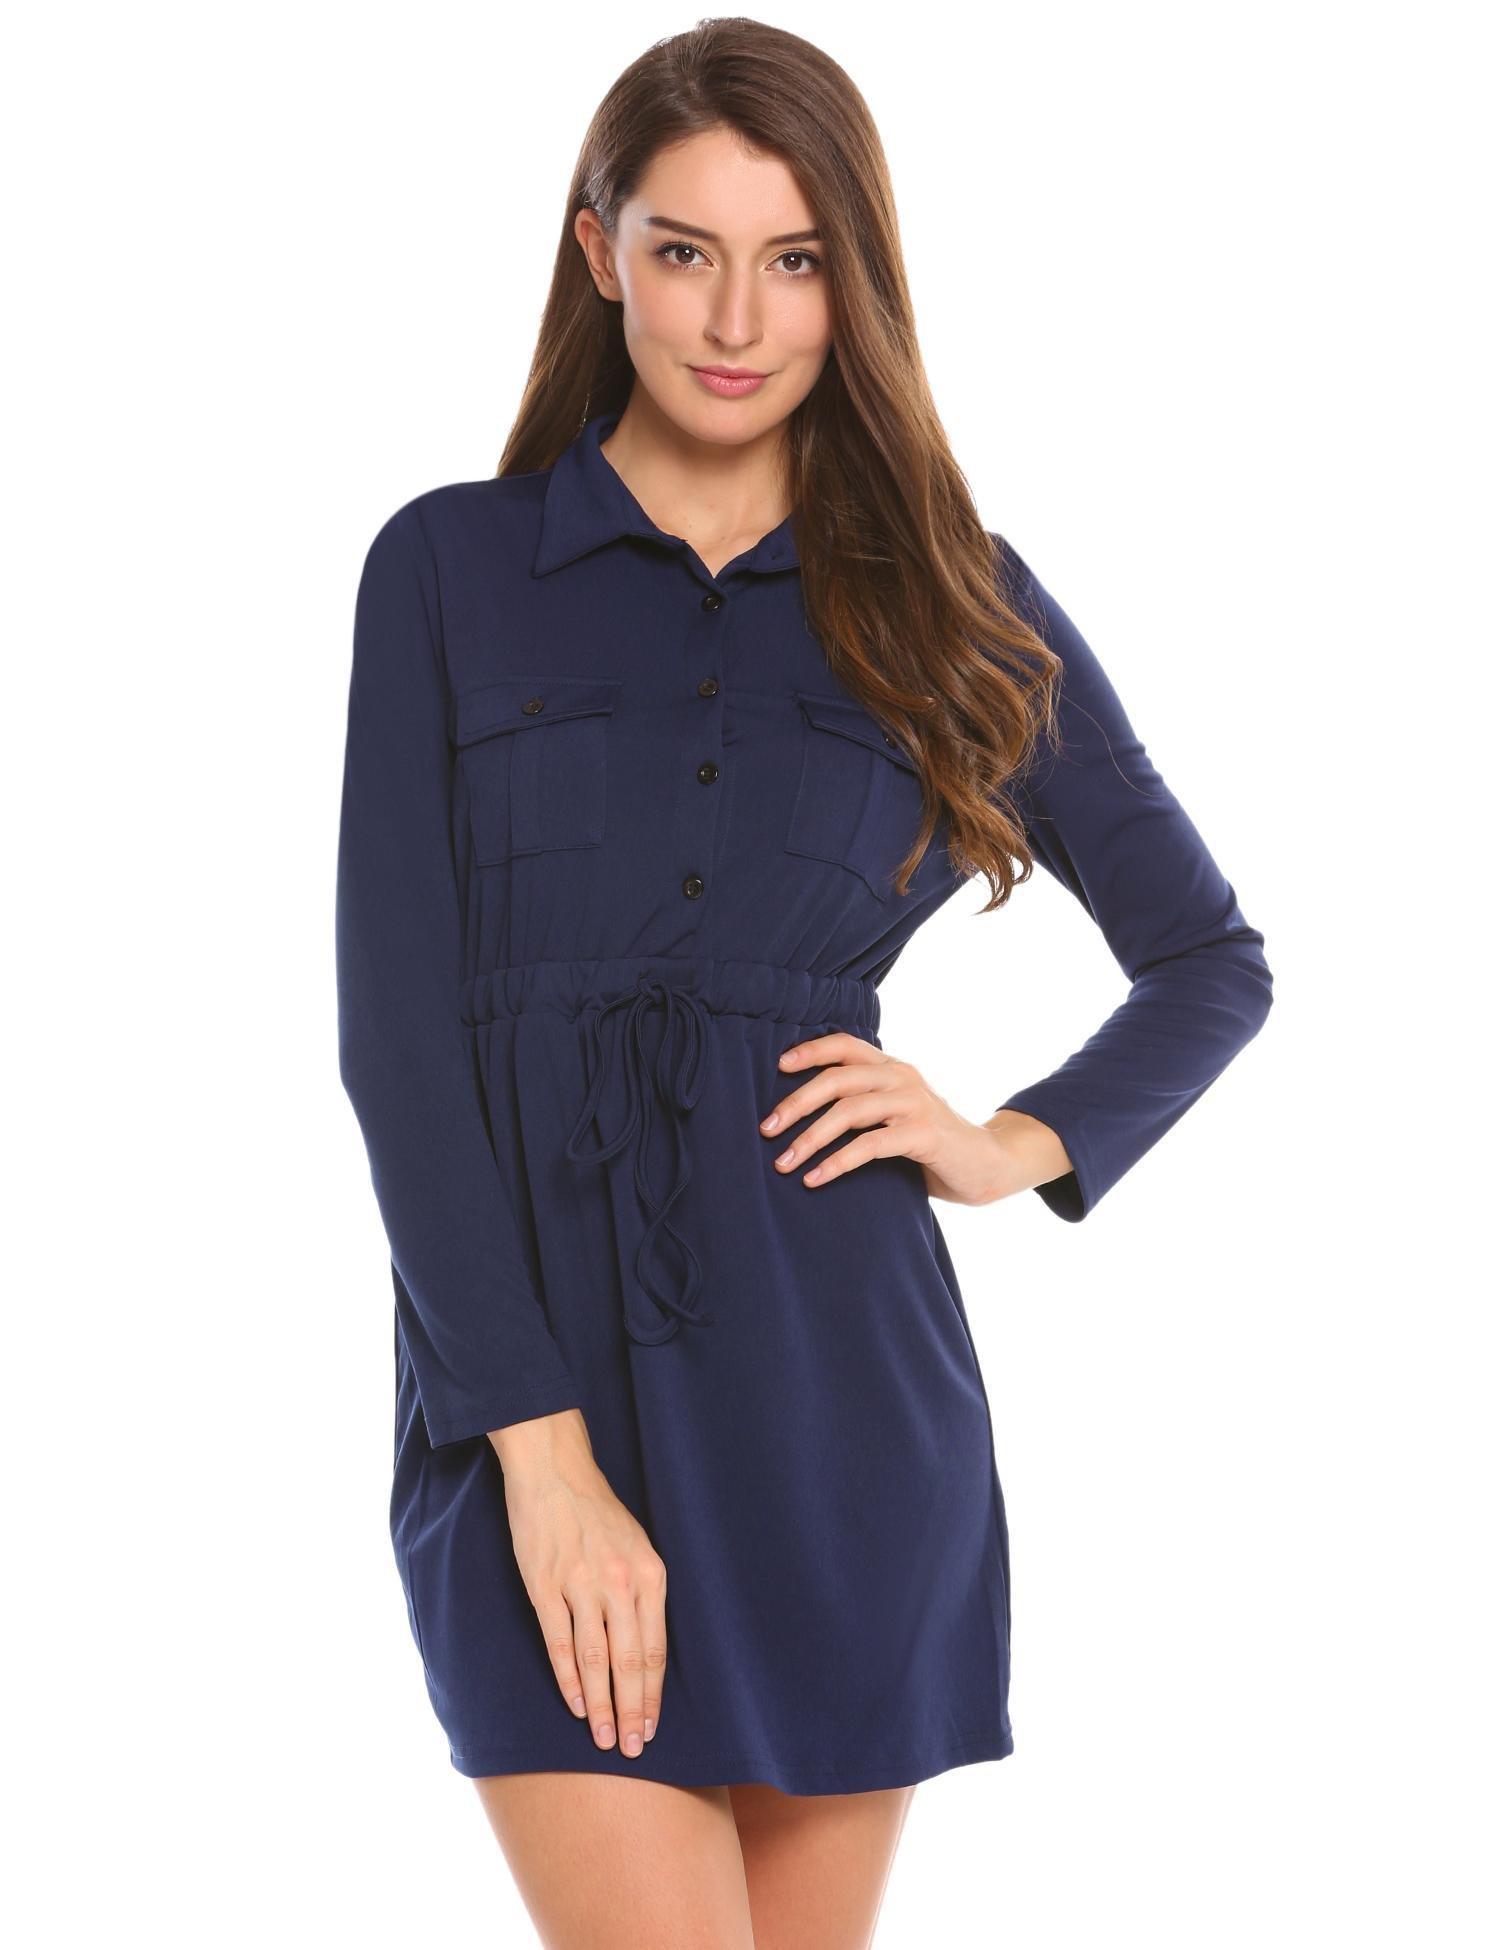 Misakia Women Shirts Button Down Long Sleeve Shift Mini Dress Long Tops (Navy Blue XL)